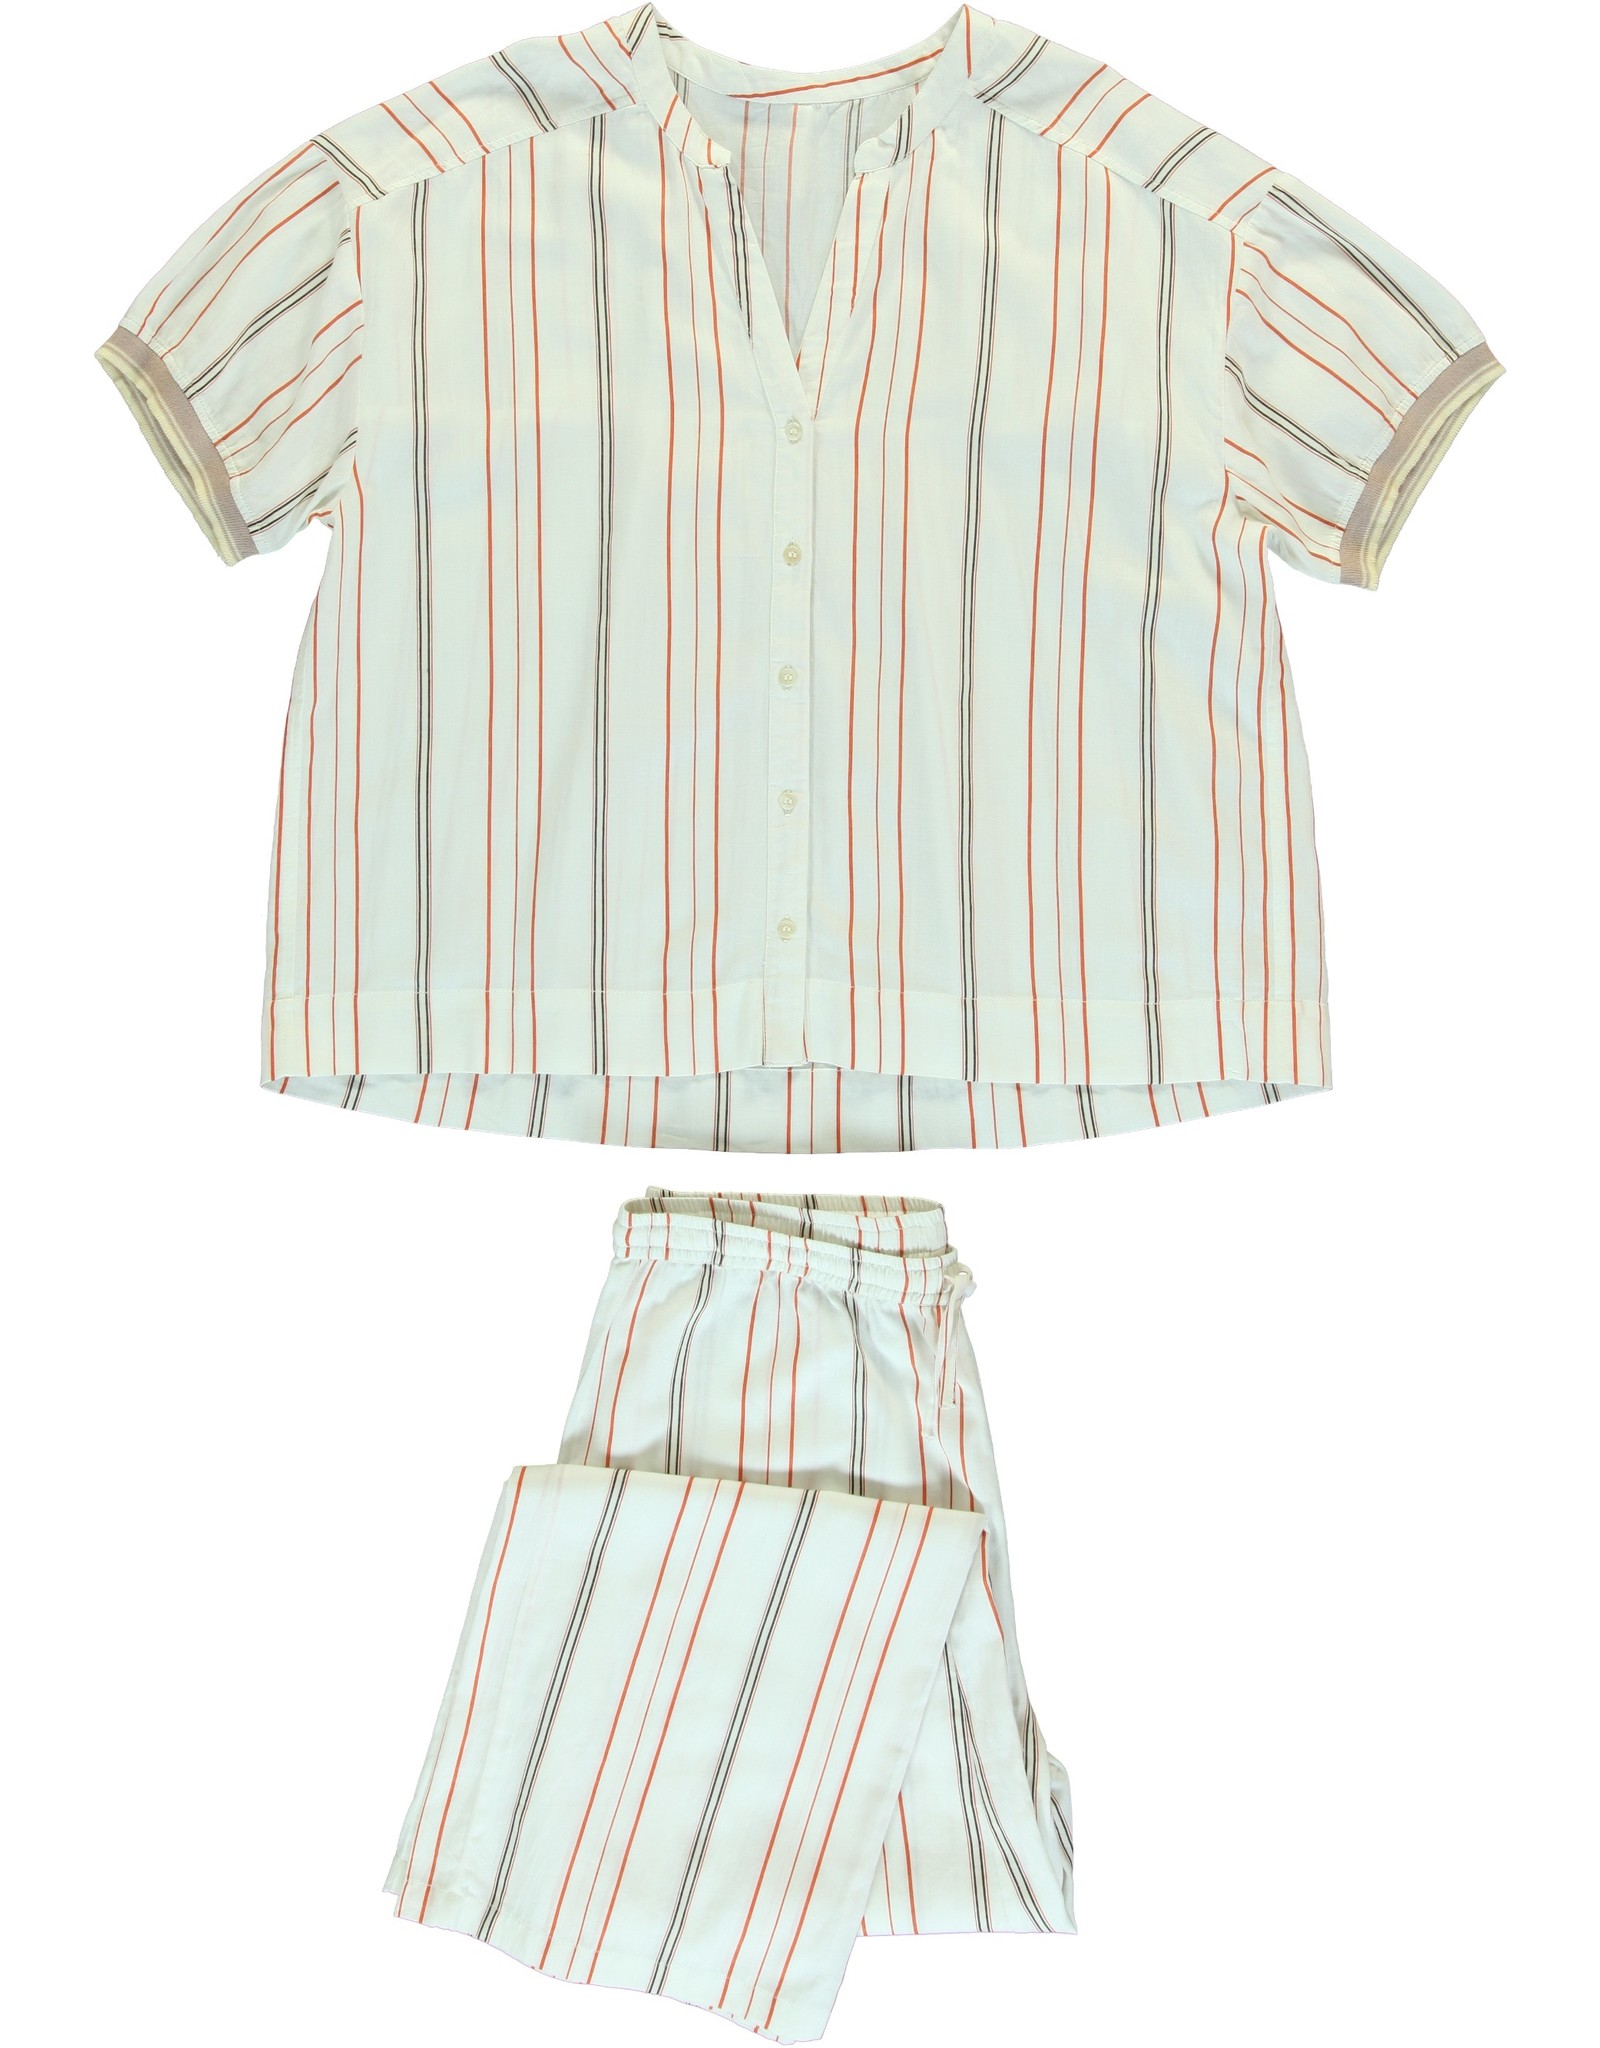 Dorélit Canopus & Alkes   Pajama Set Woven   Chili